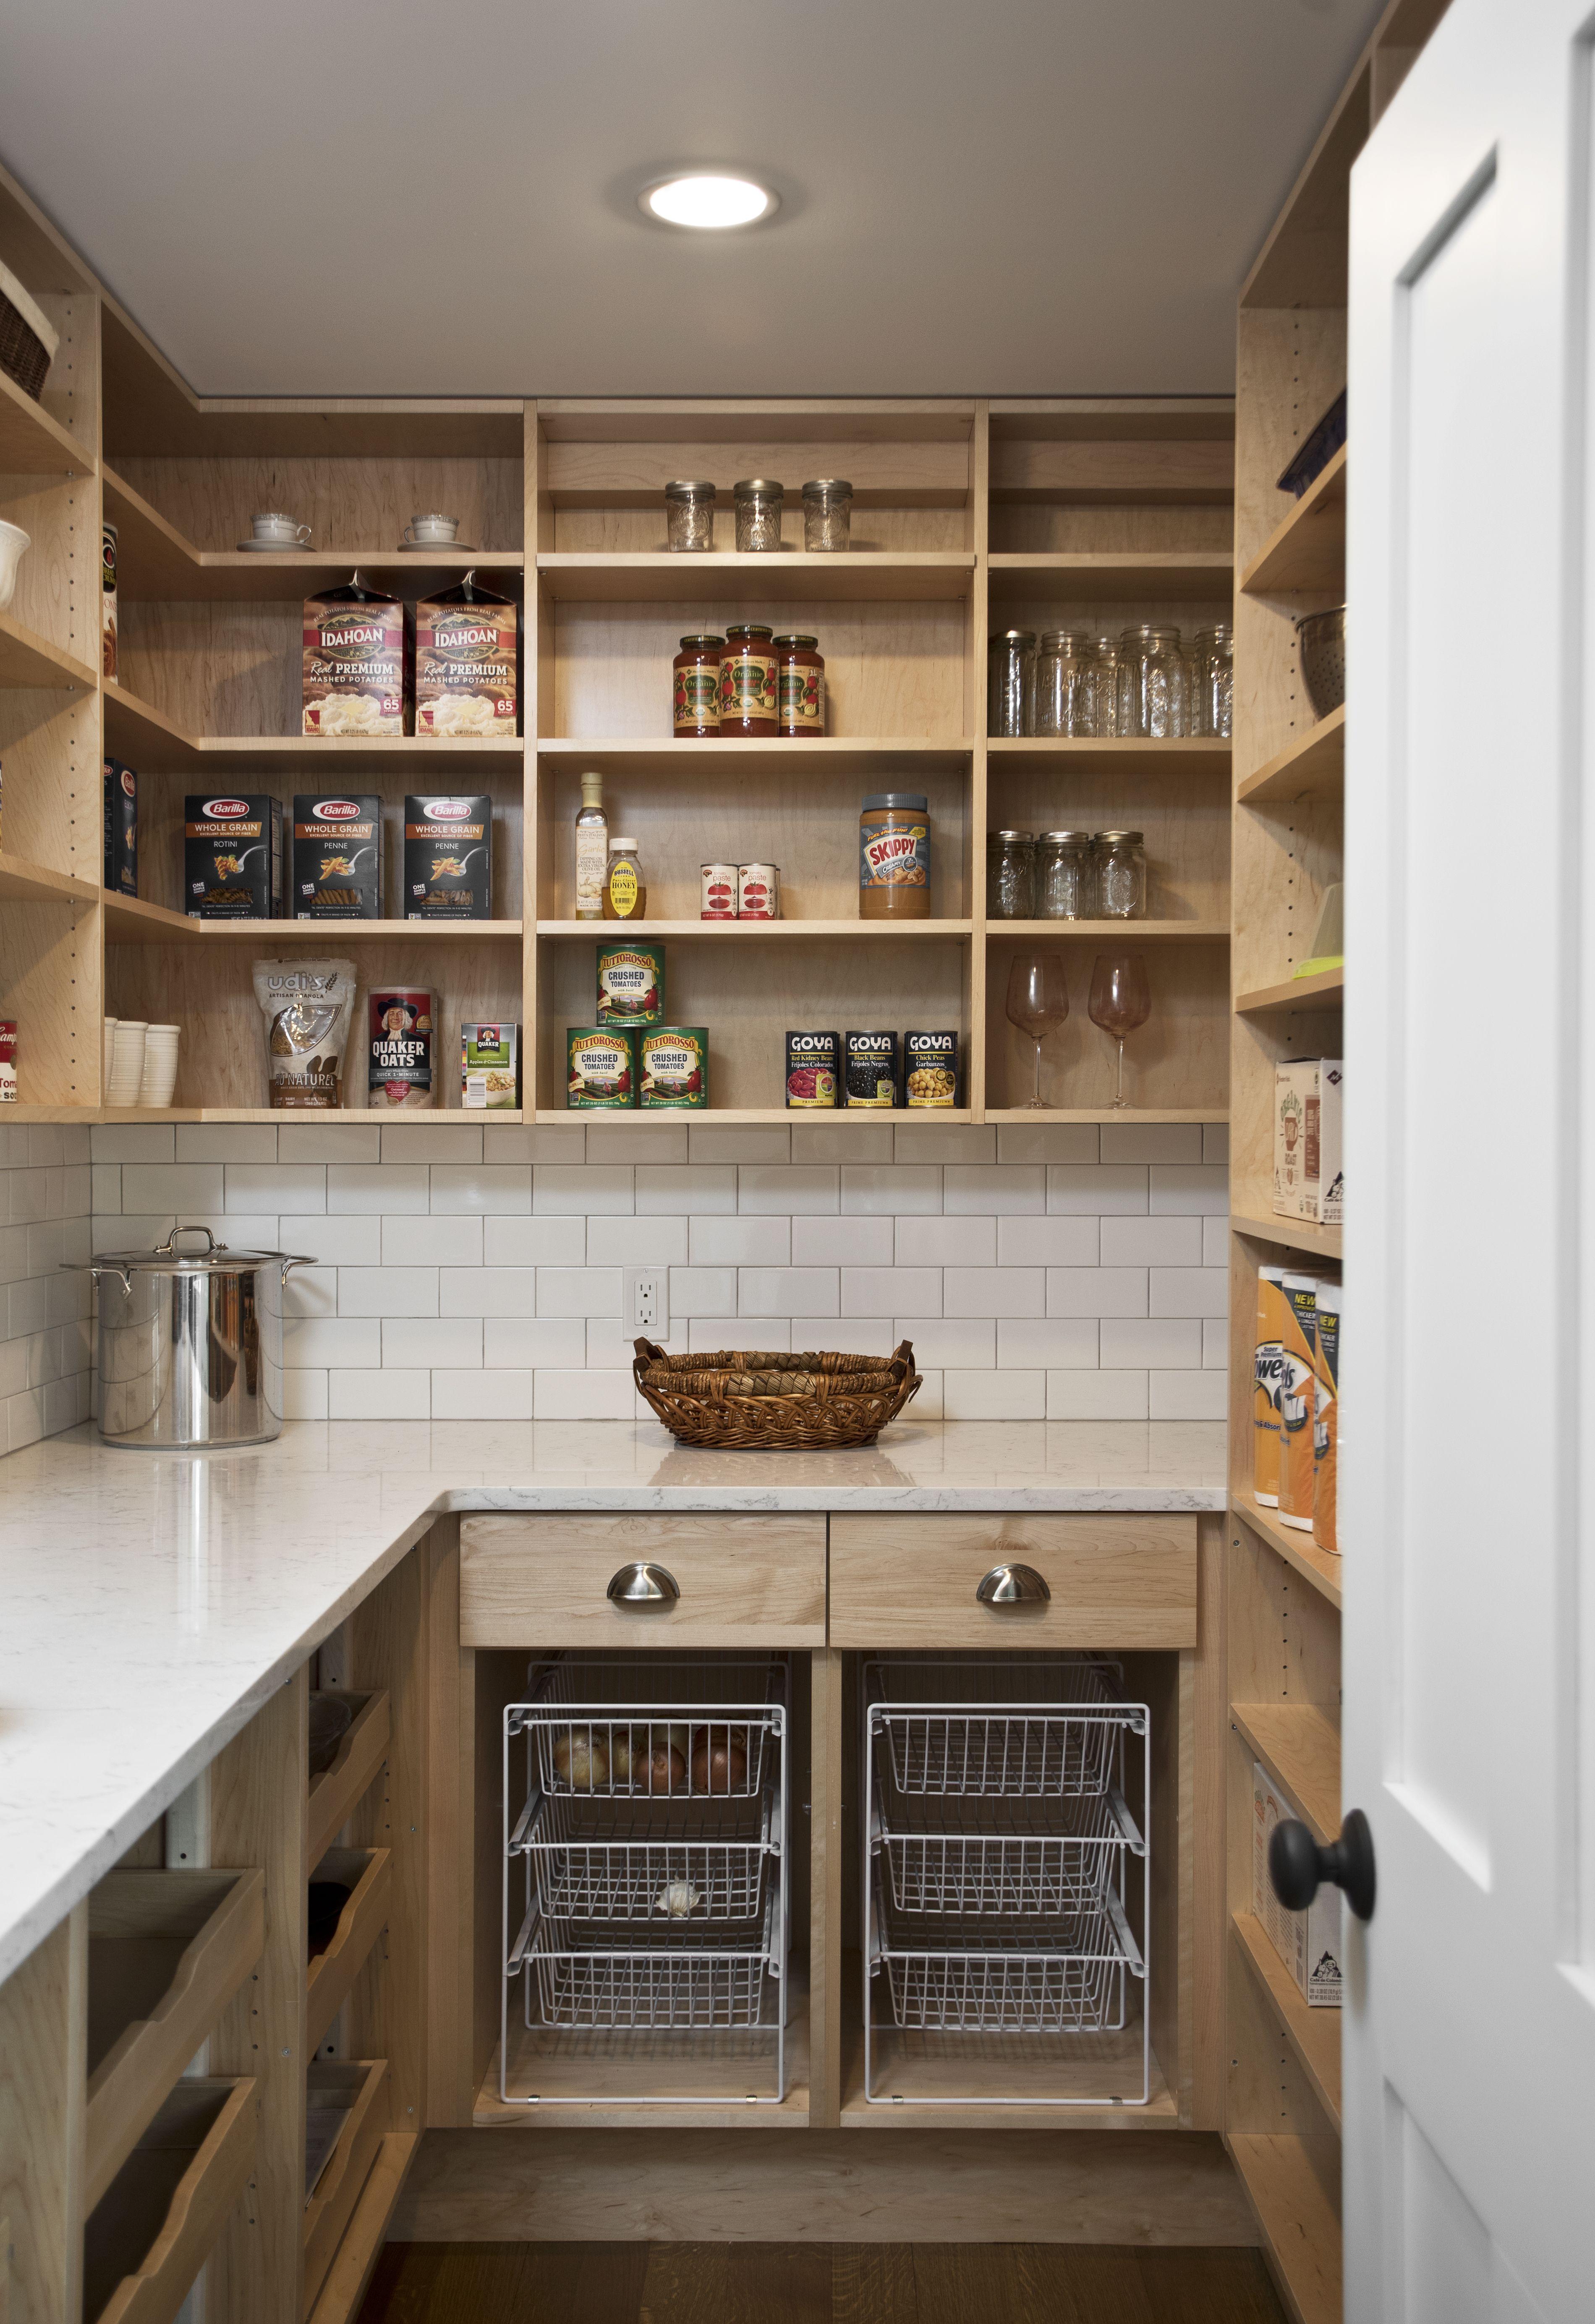 pantrydesign organizedpantry pantrystorage Kitchen